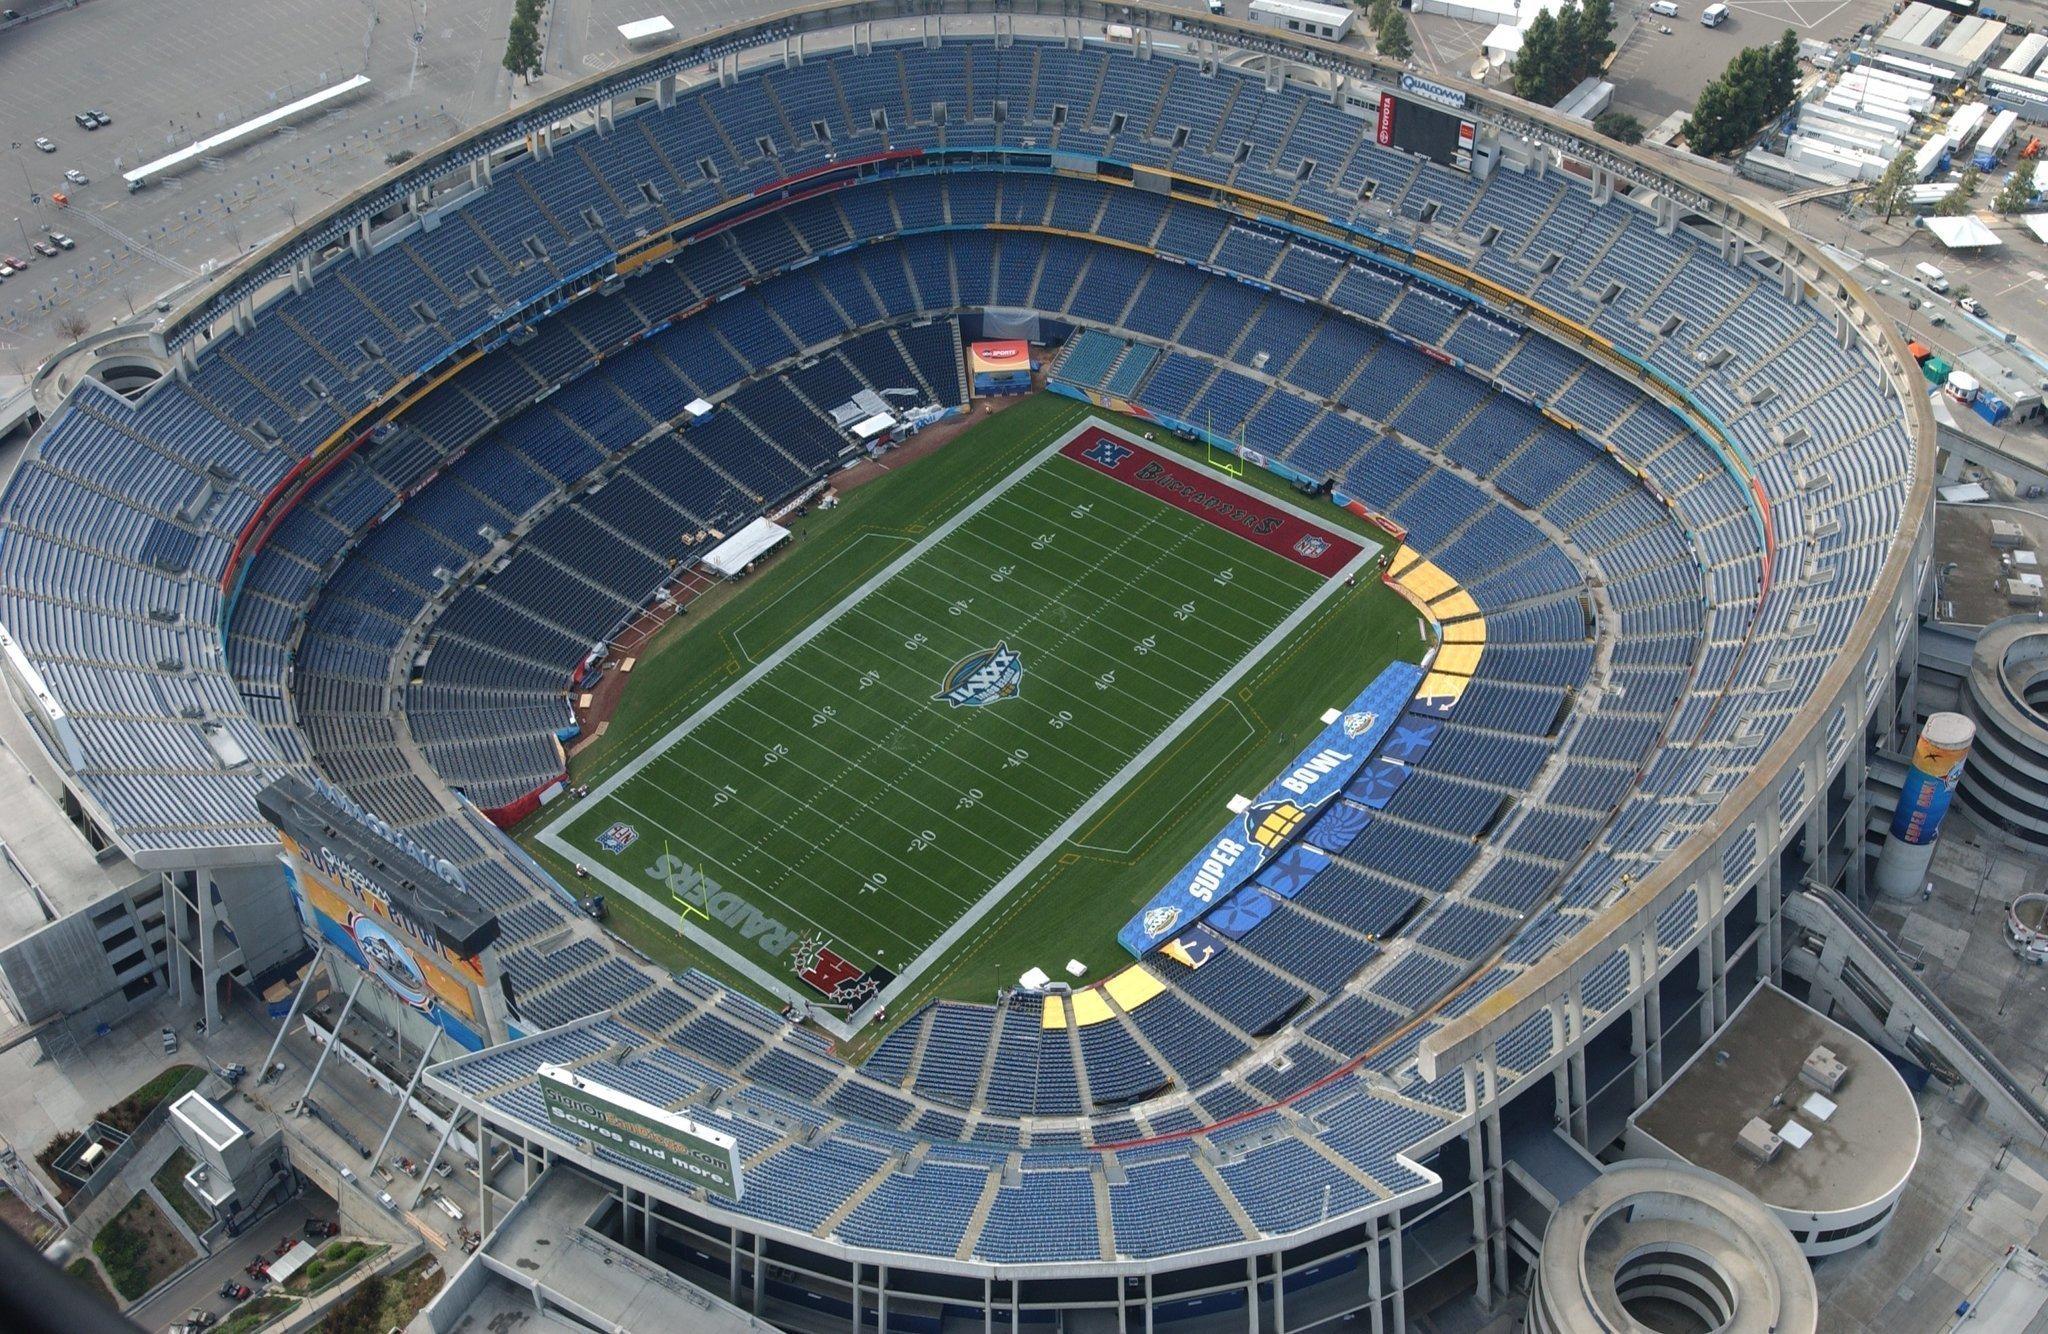 Qualcomm Rated 4th Worst Stadium Arena The San Diego